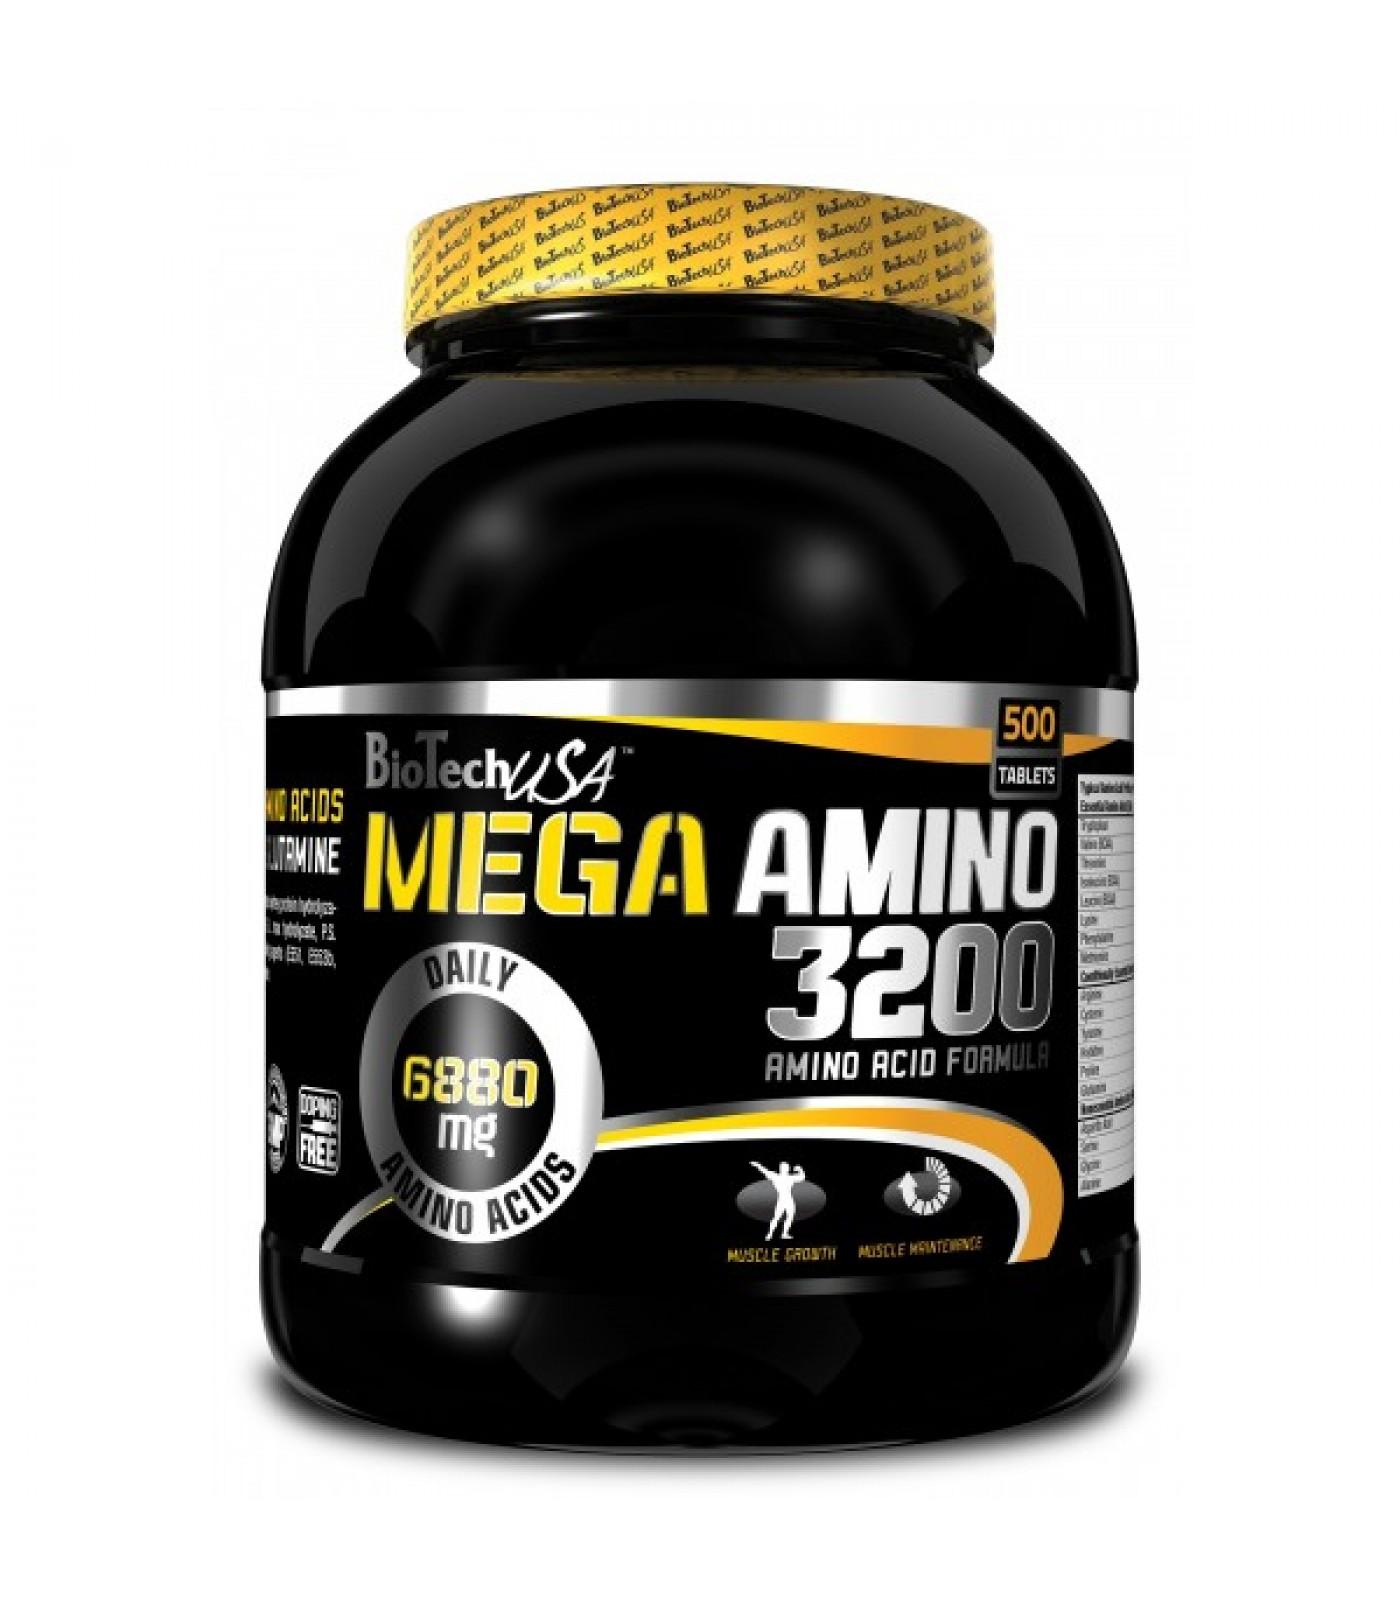 BioTech - Mega Amino 3200 / 500 tabs.